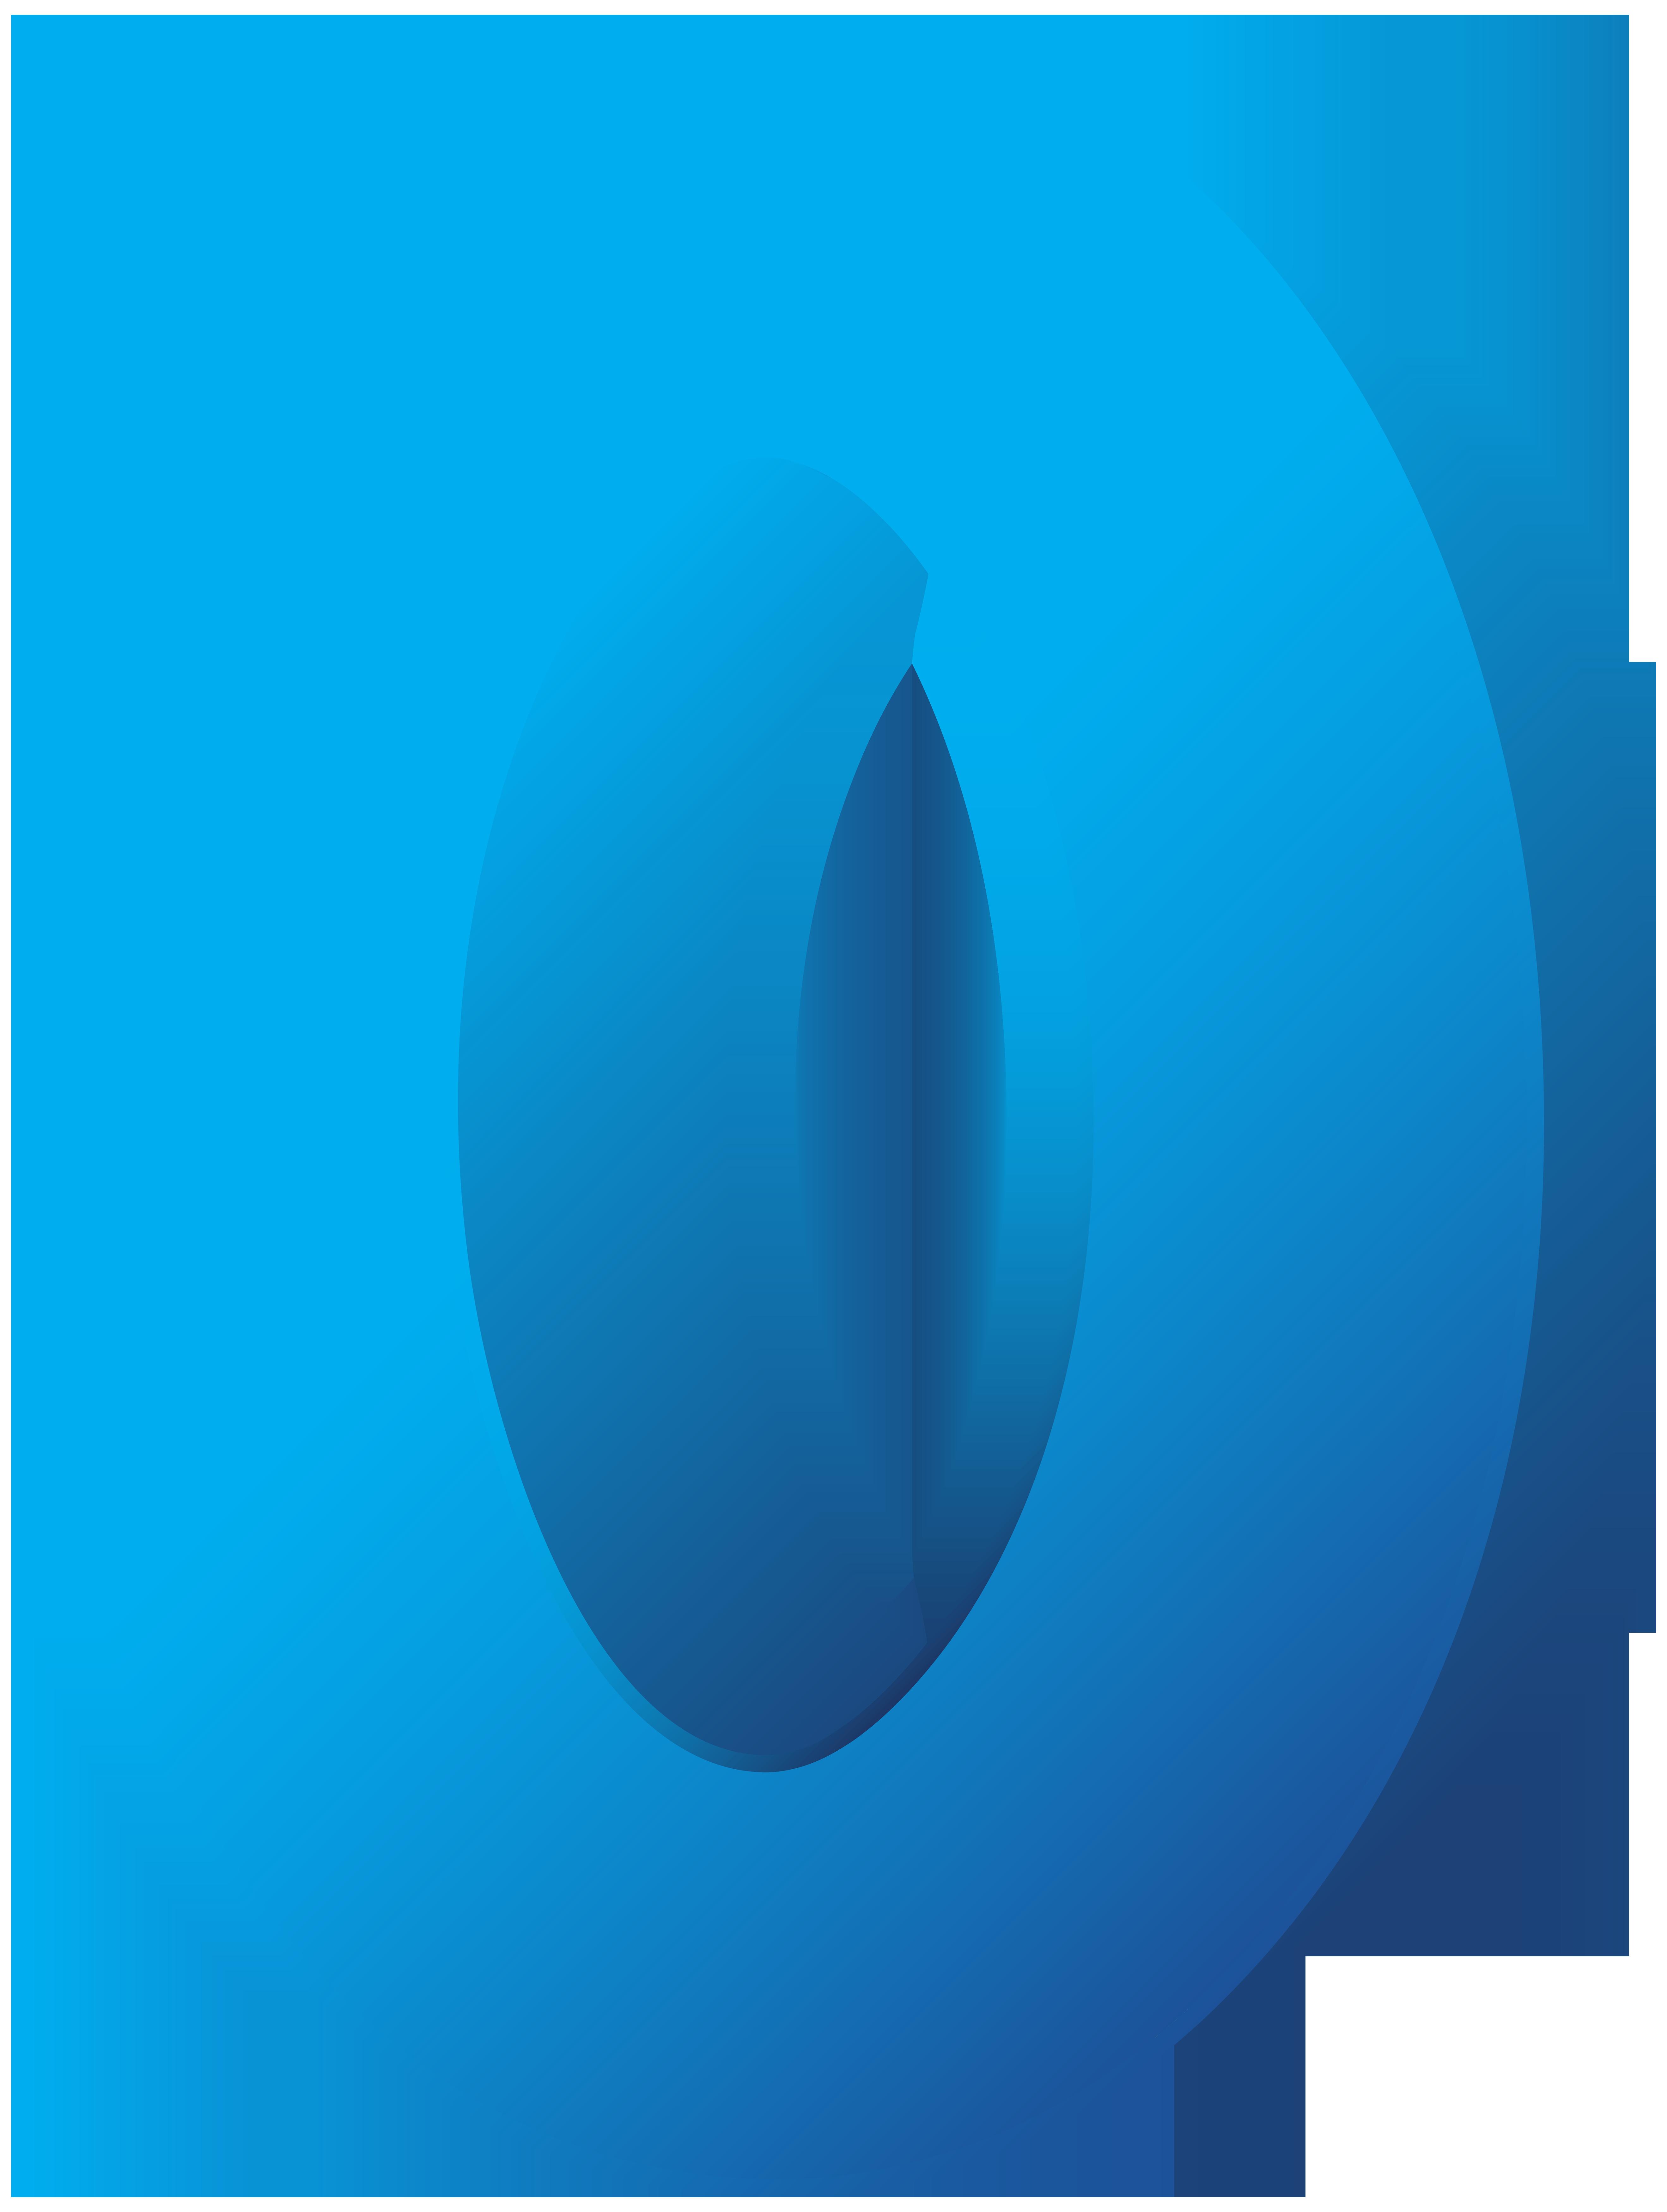 5275x7000 Blue Number Zero Transparent Png Clip Art Imageu200b Gallery